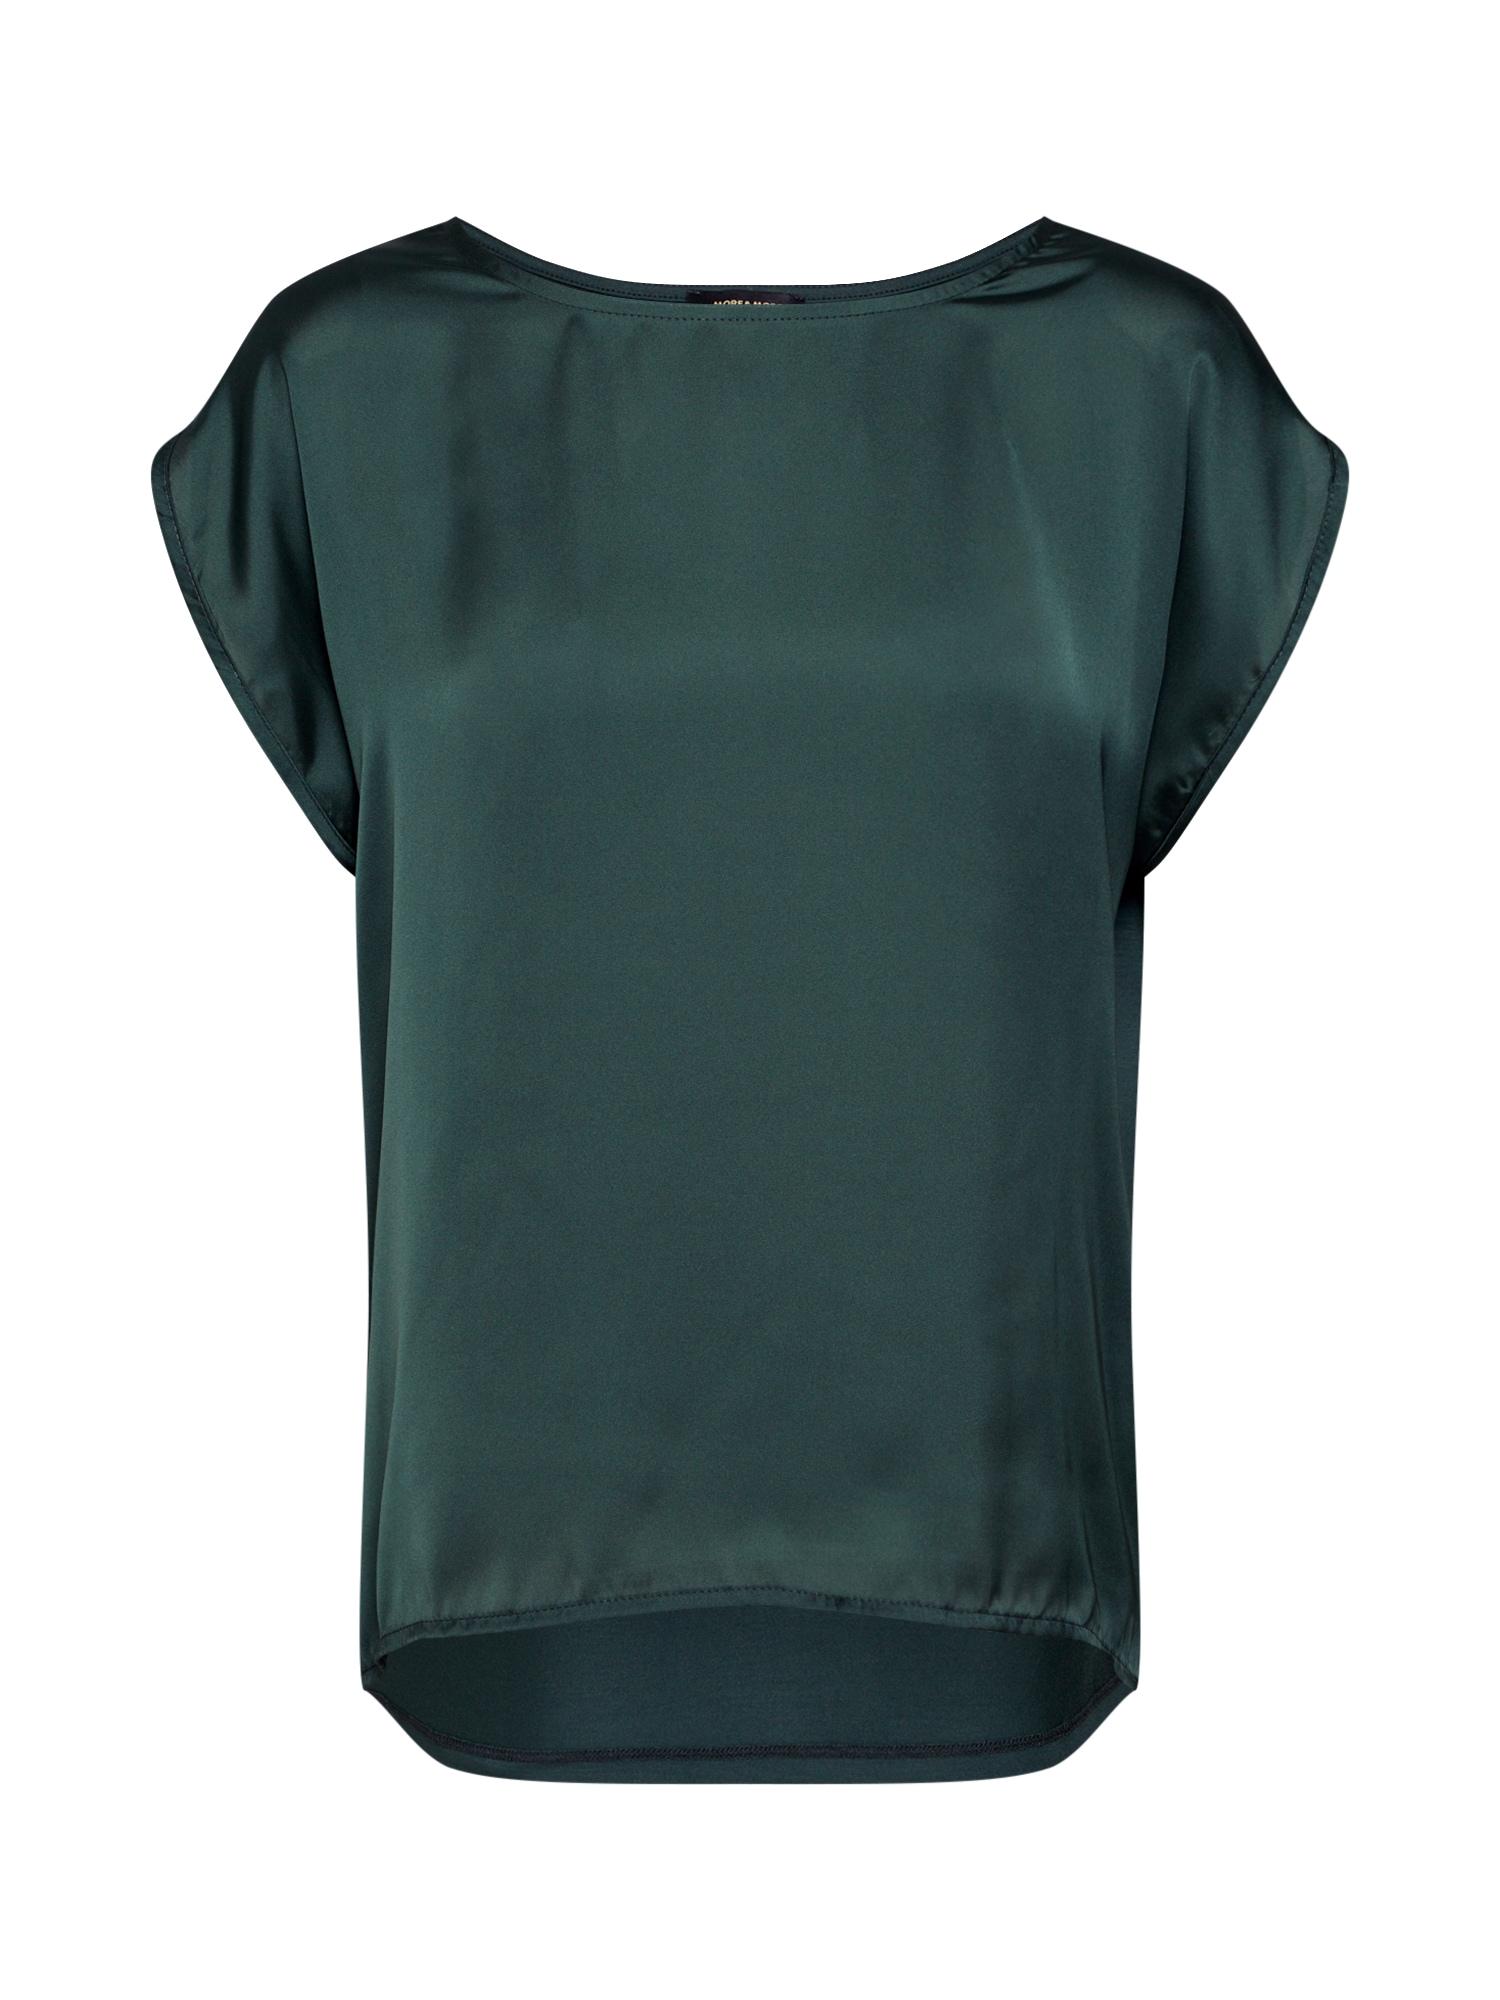 Shirt   Bekleidung > Shirts > Sonstige Shirts   Grün   MORE & MORE